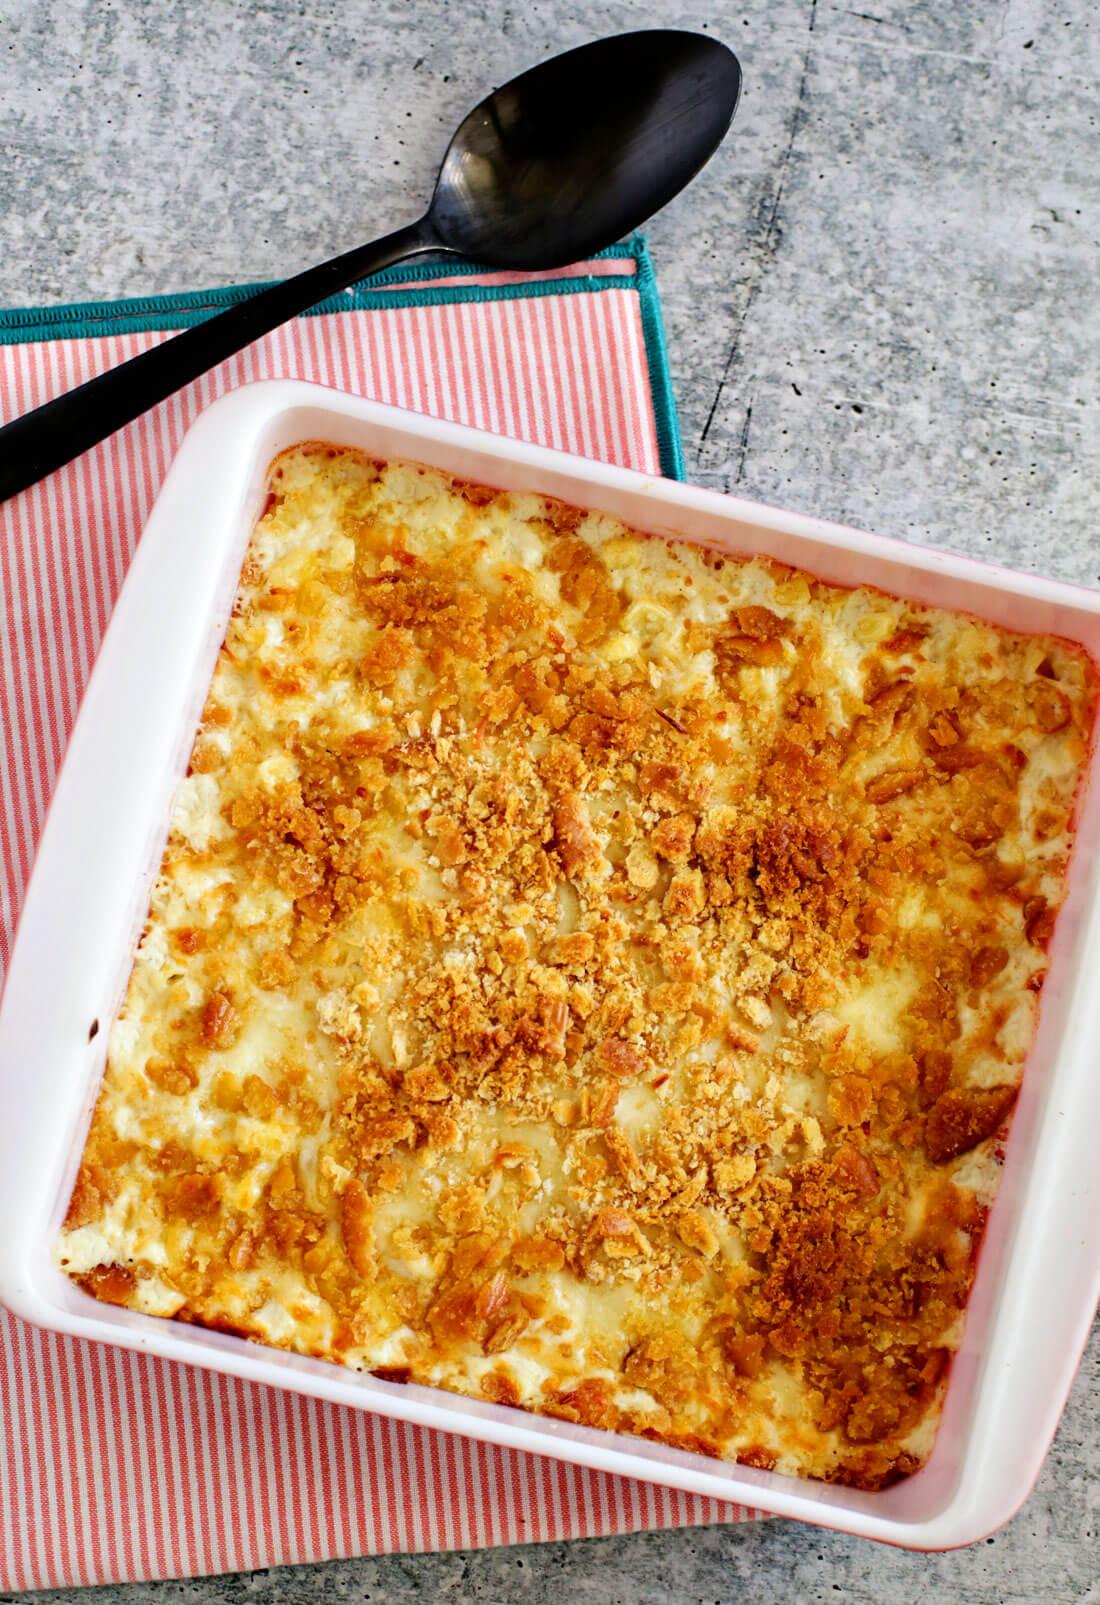 Full pan of creamed corn casserole